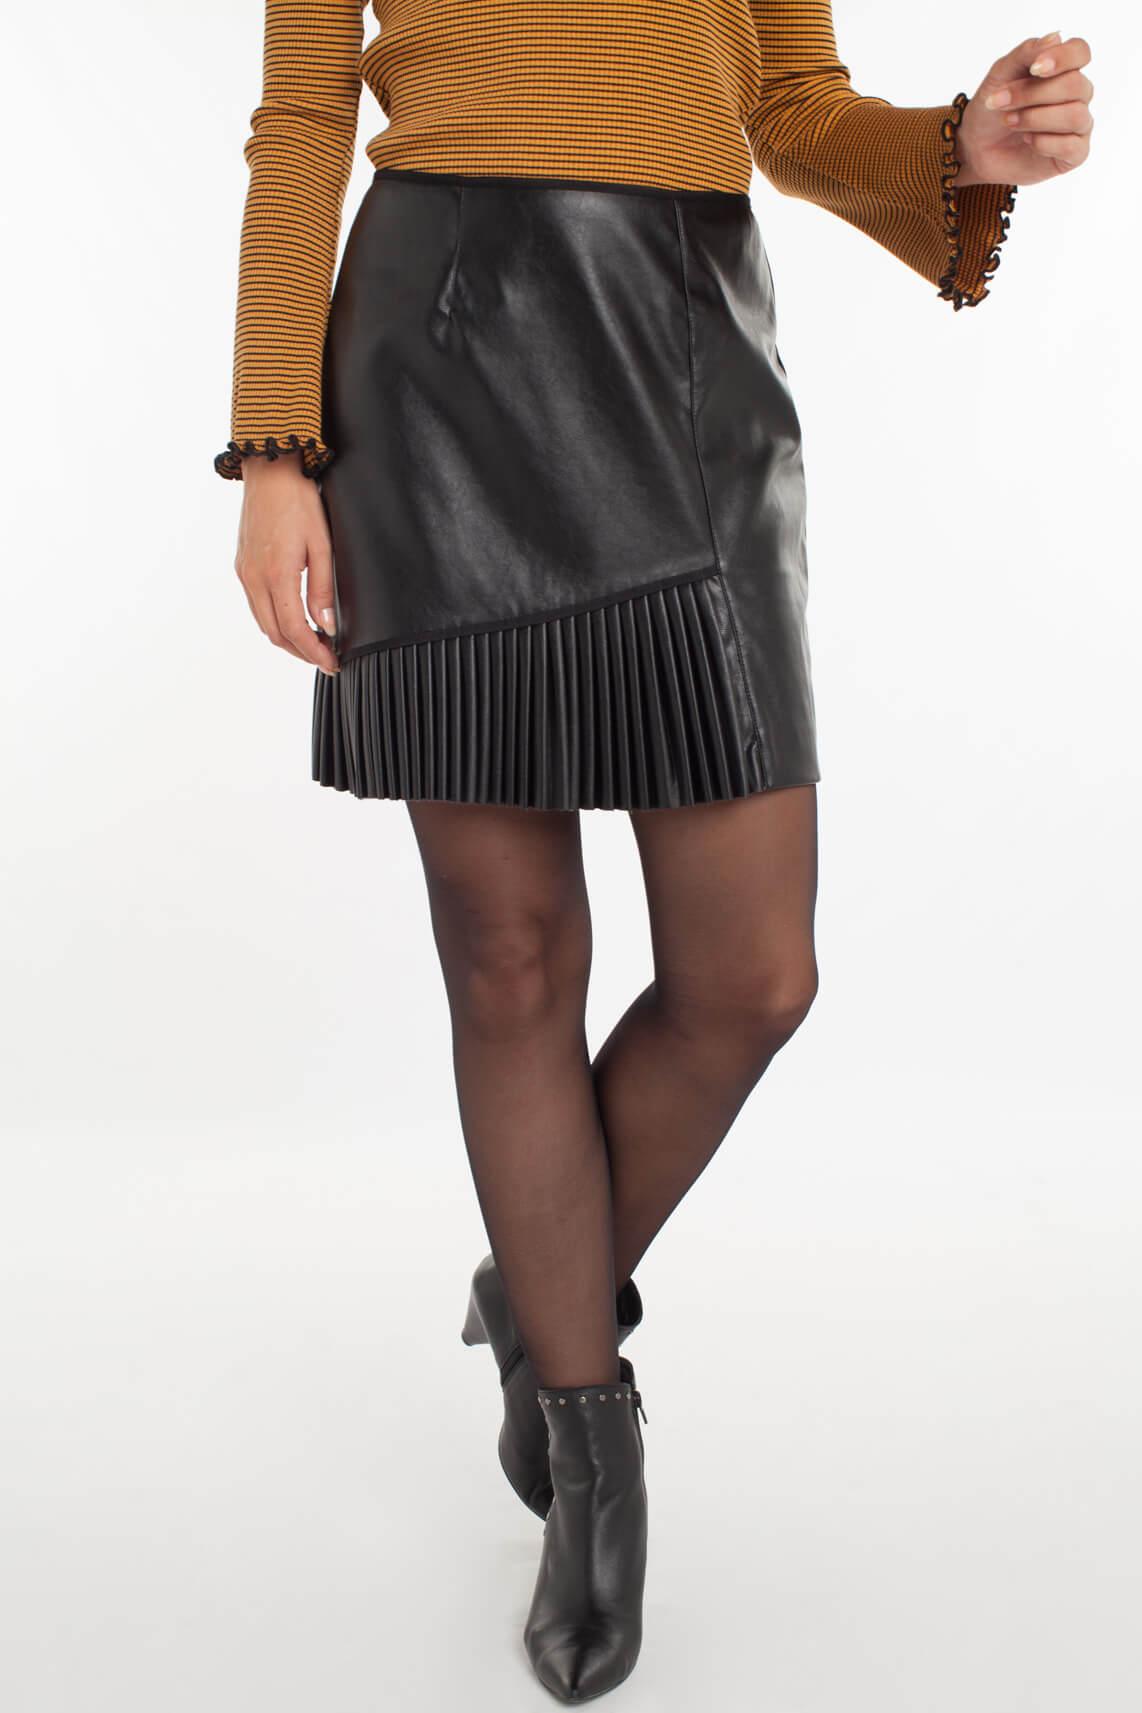 Kocca Dames Cansel rok met plissé detail zwart